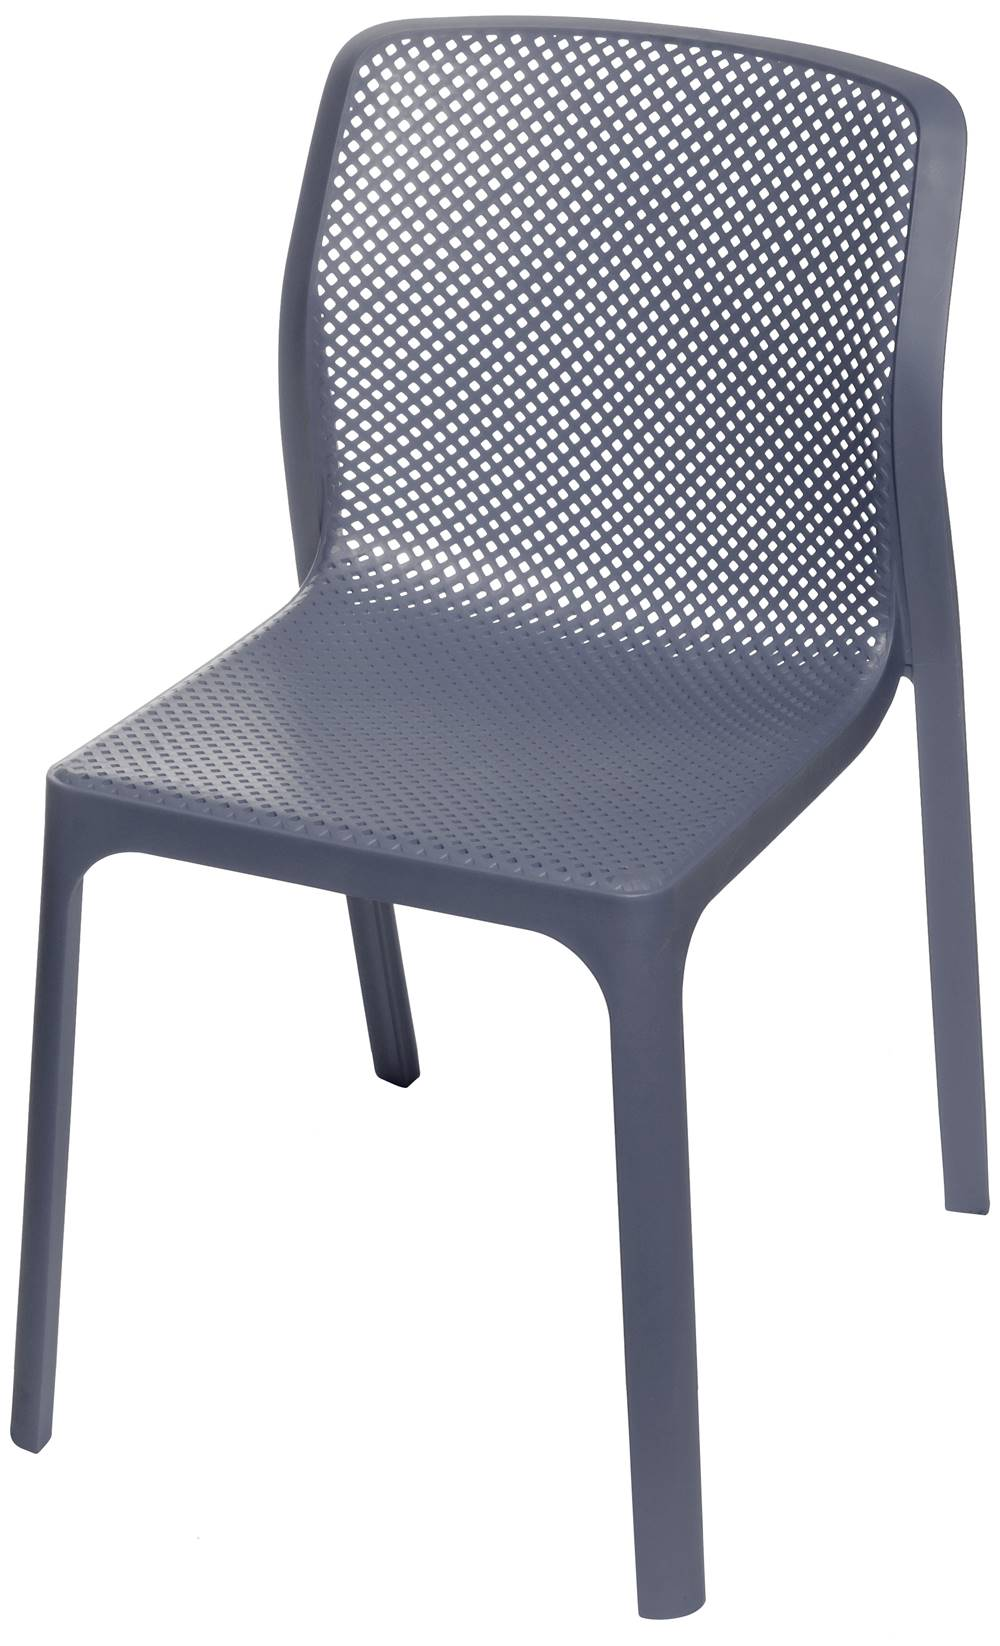 Cadeira Bit Nard Empilhavel Polipropileno Preta - 53558